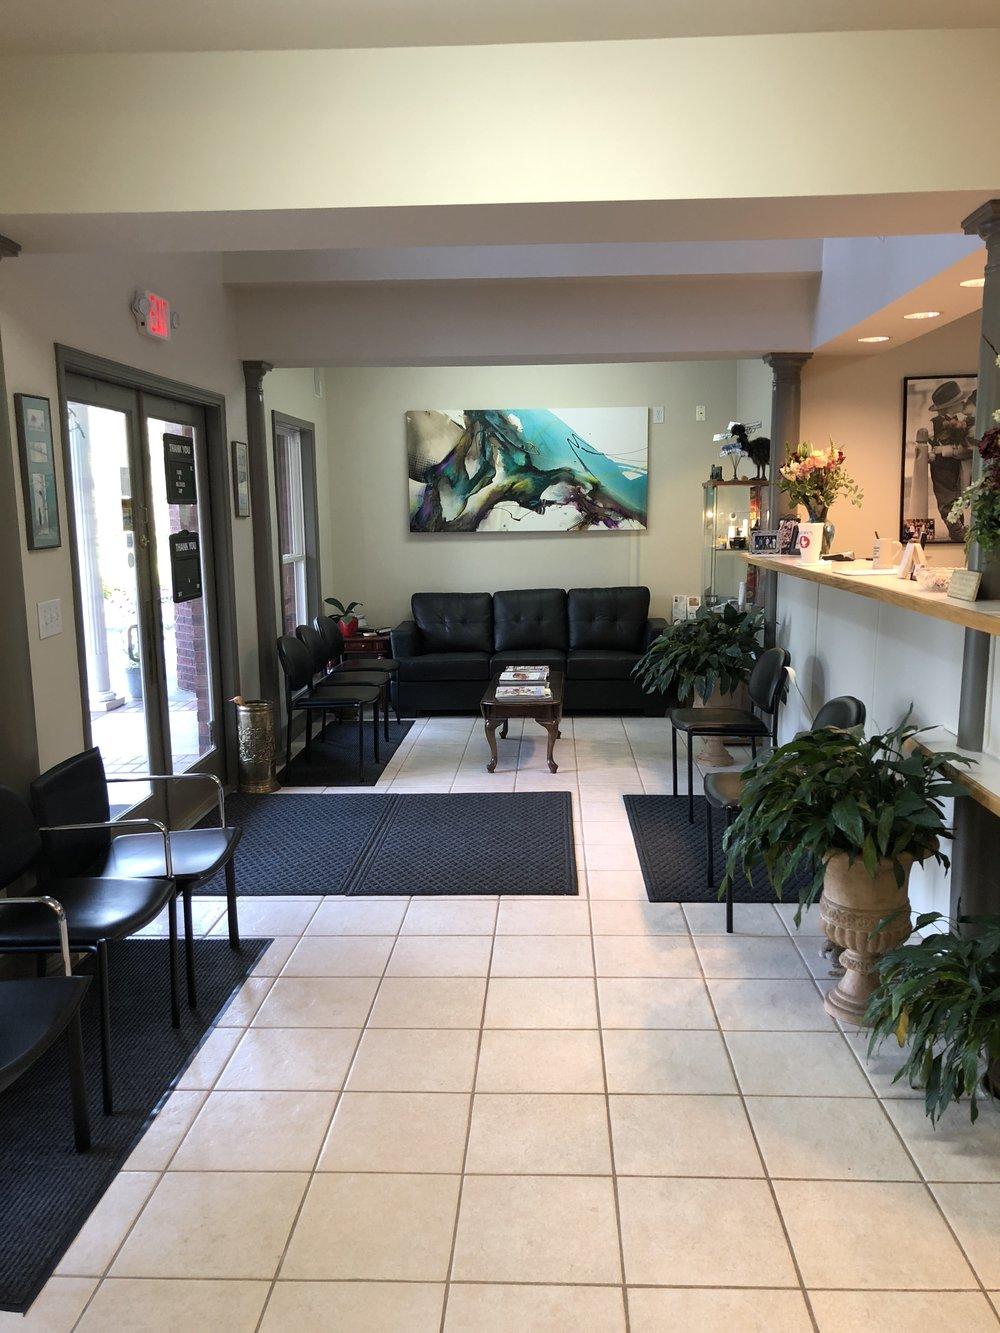 IMG_1791.JPG waiting room